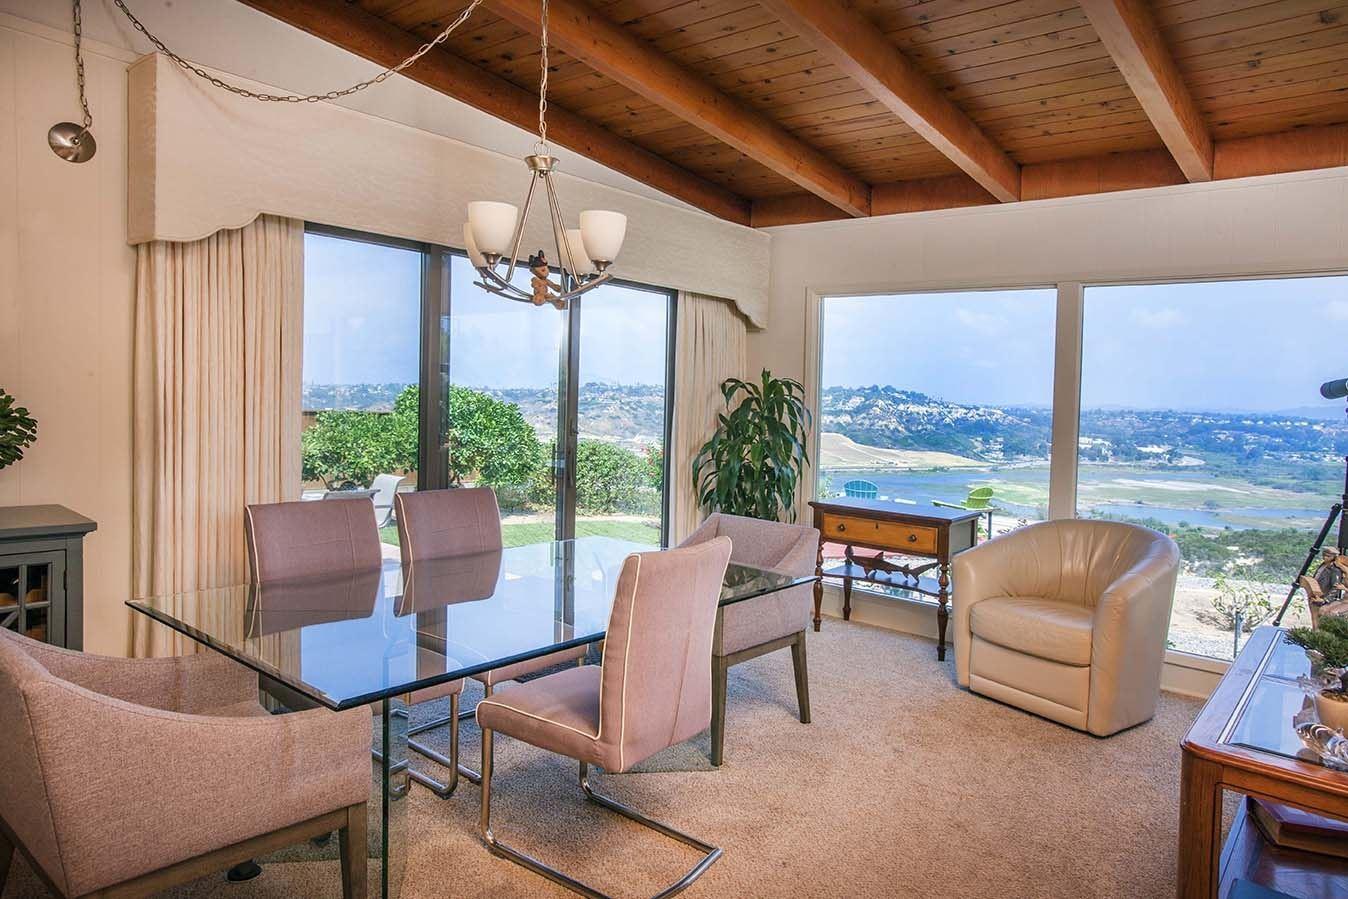 Photo for 638 Canyon Dr, Solana Beach, CA 92075 (MLS # 200046925)